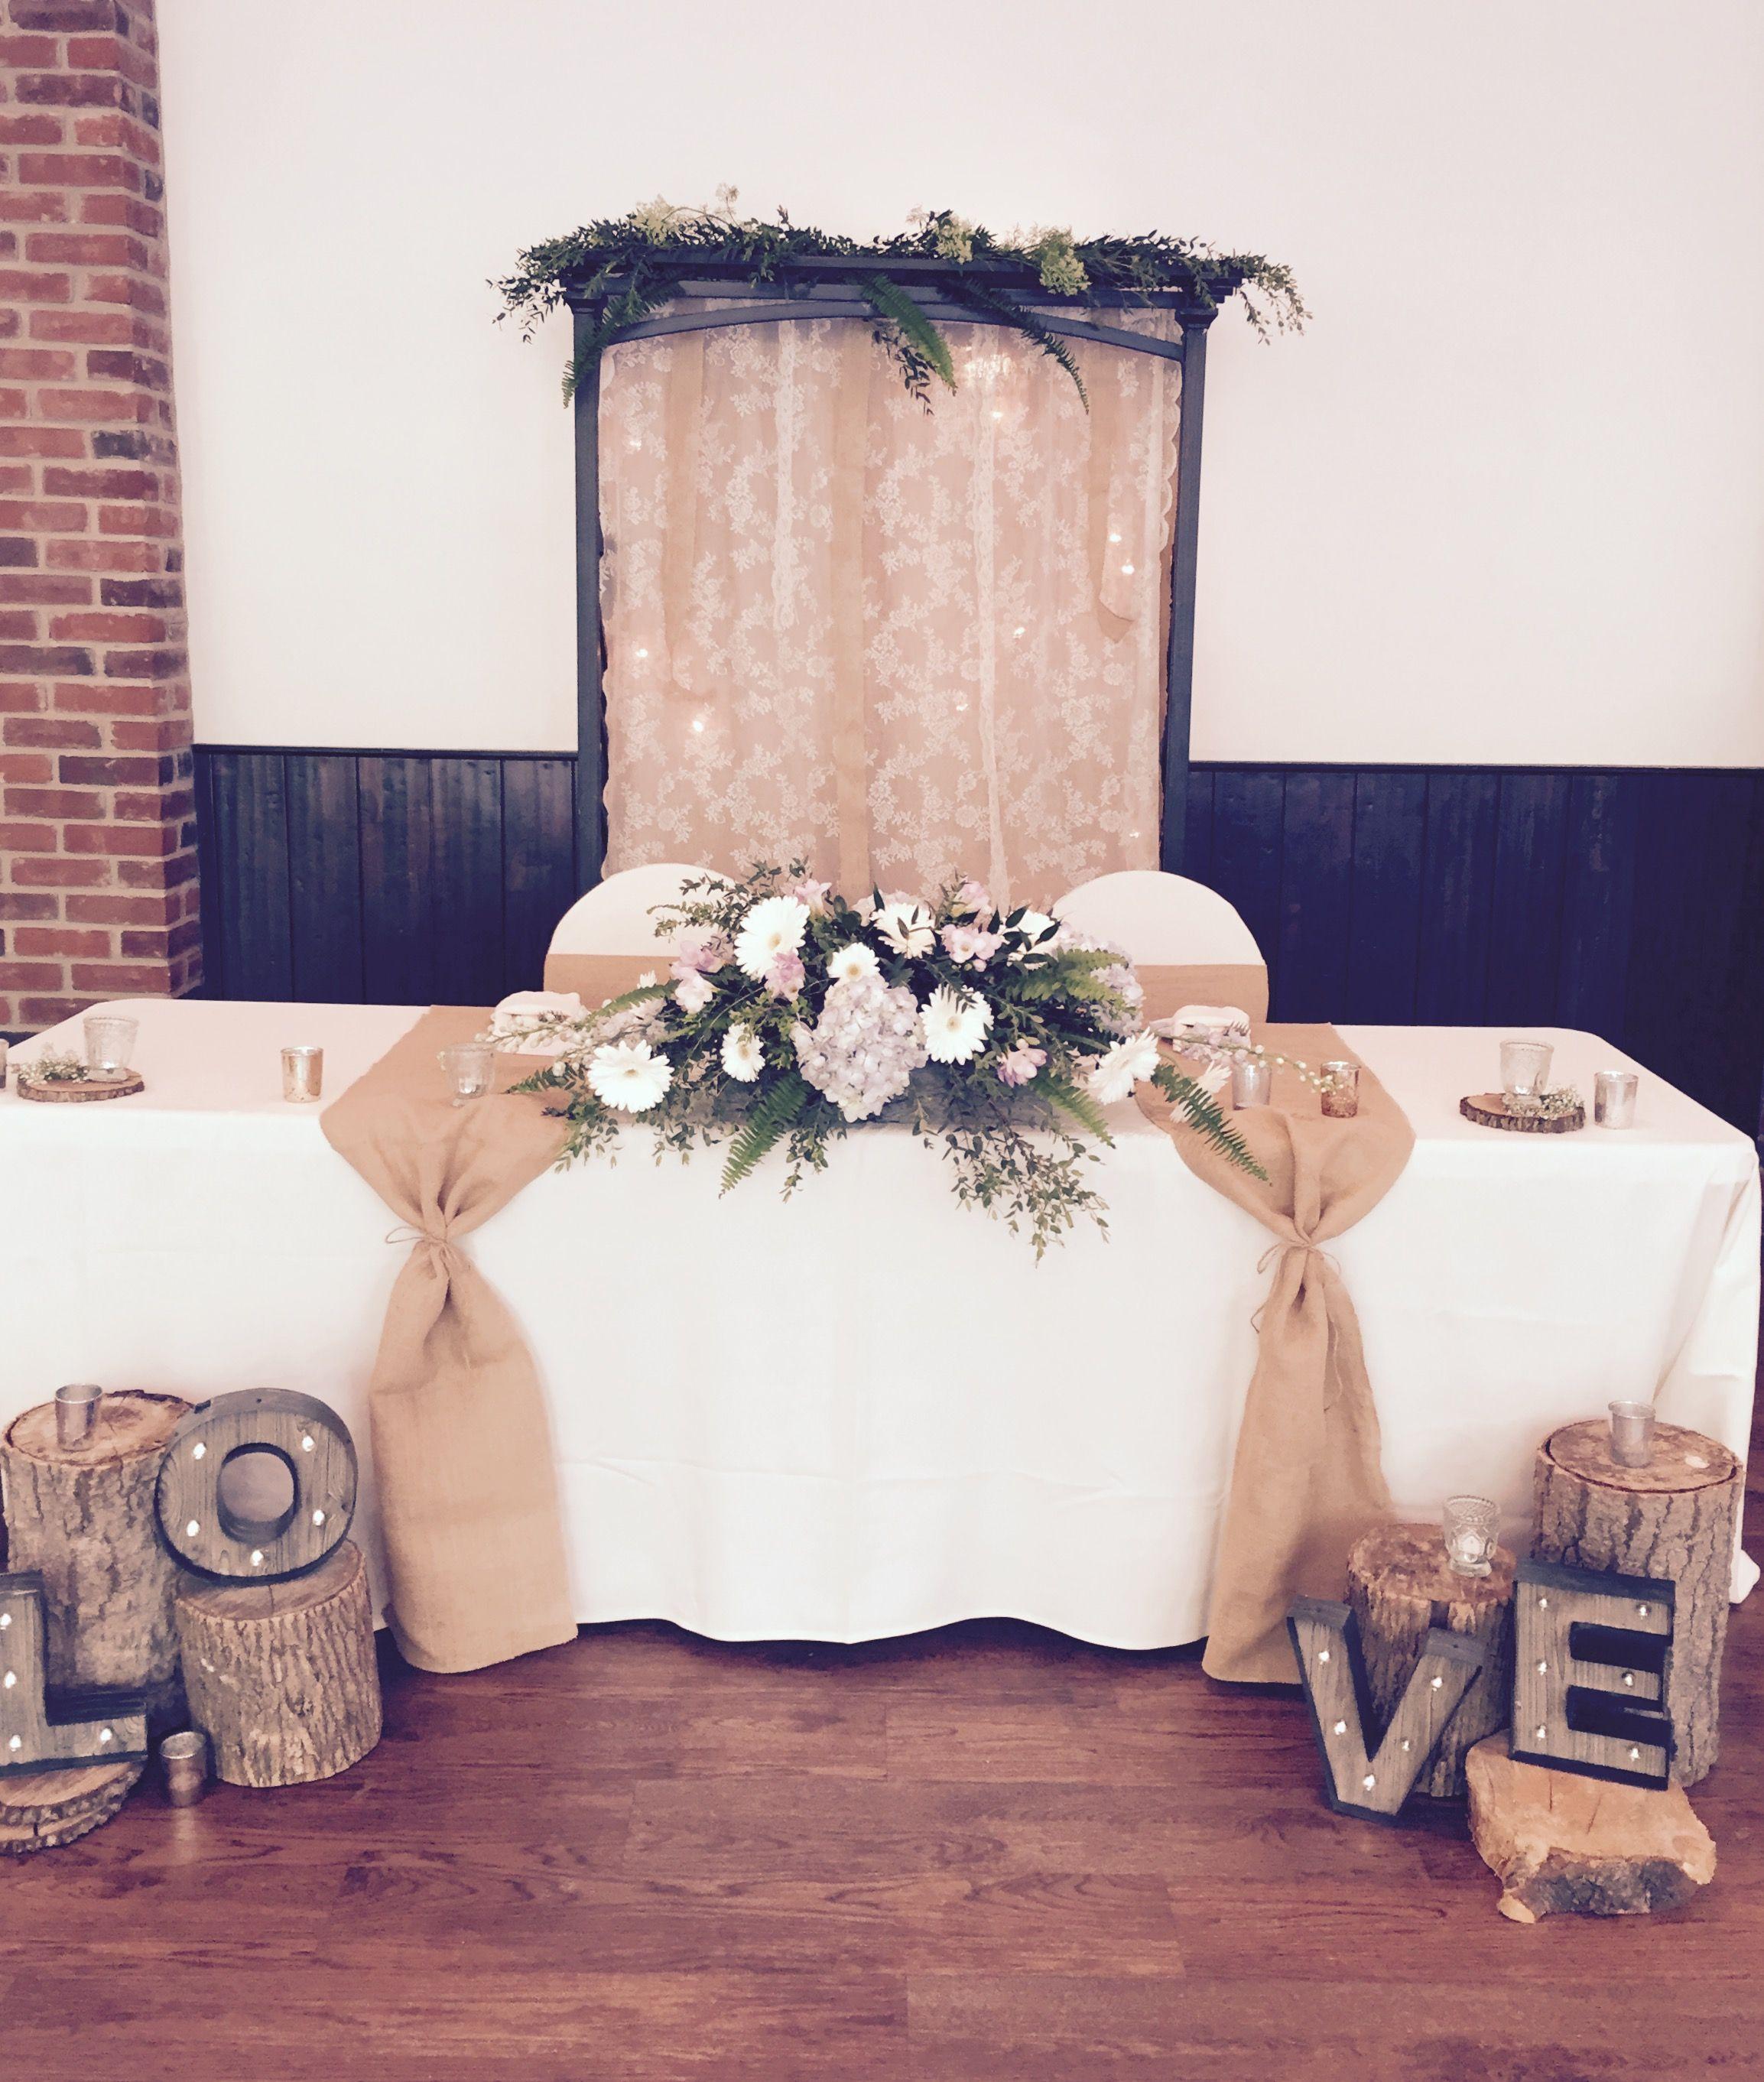 Wedding Head Table Decoration Ideas: Gorgeous Rustic Head Table Wedding At Fantasy Farm